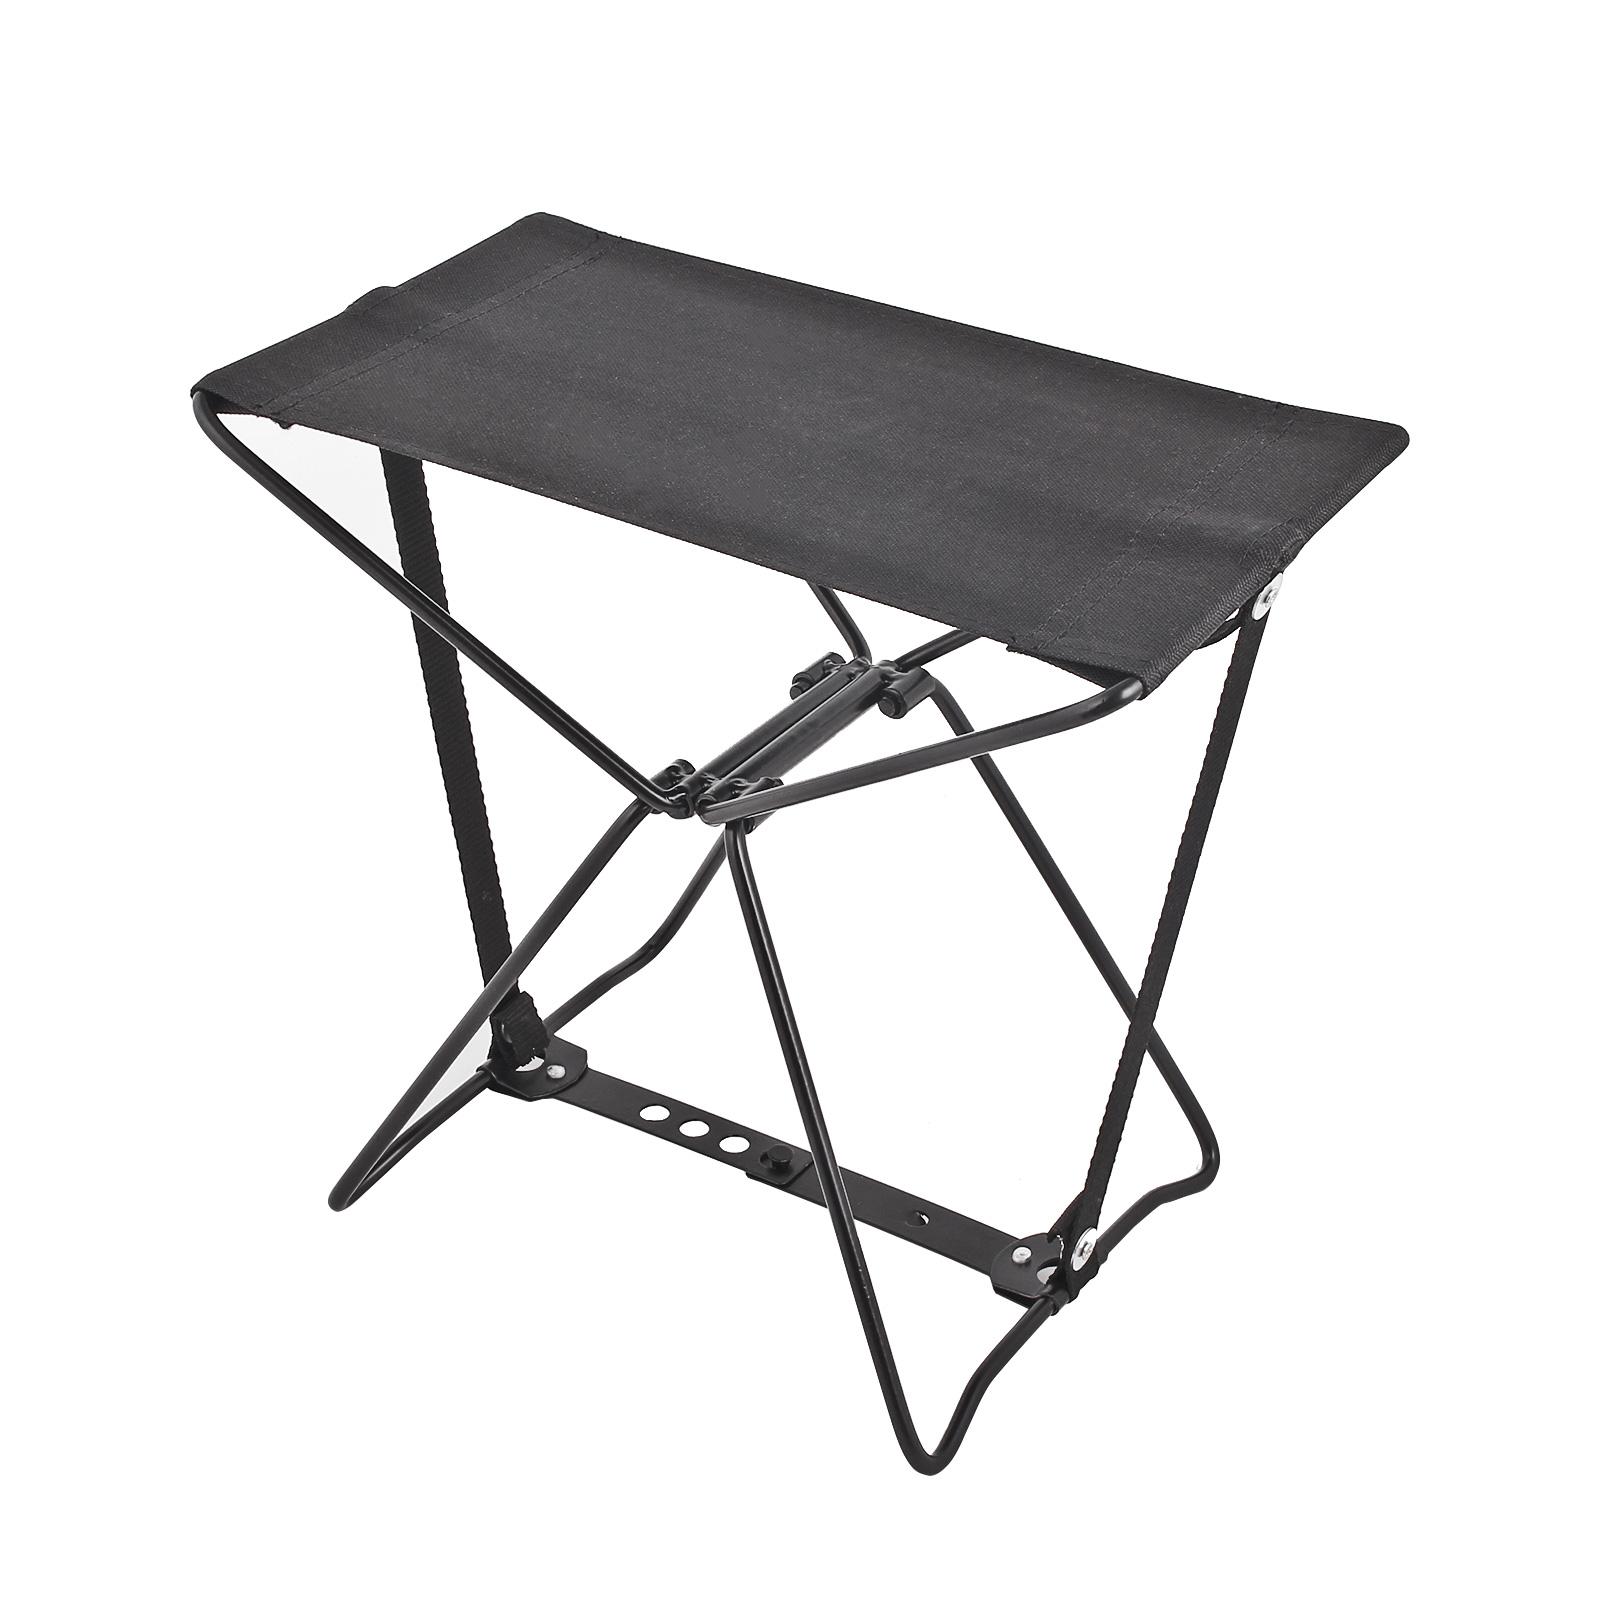 Klapphocker Bo-Camp® schwarz 29x25x15 cm 80 Kg belastbar mini Falthocker Camping